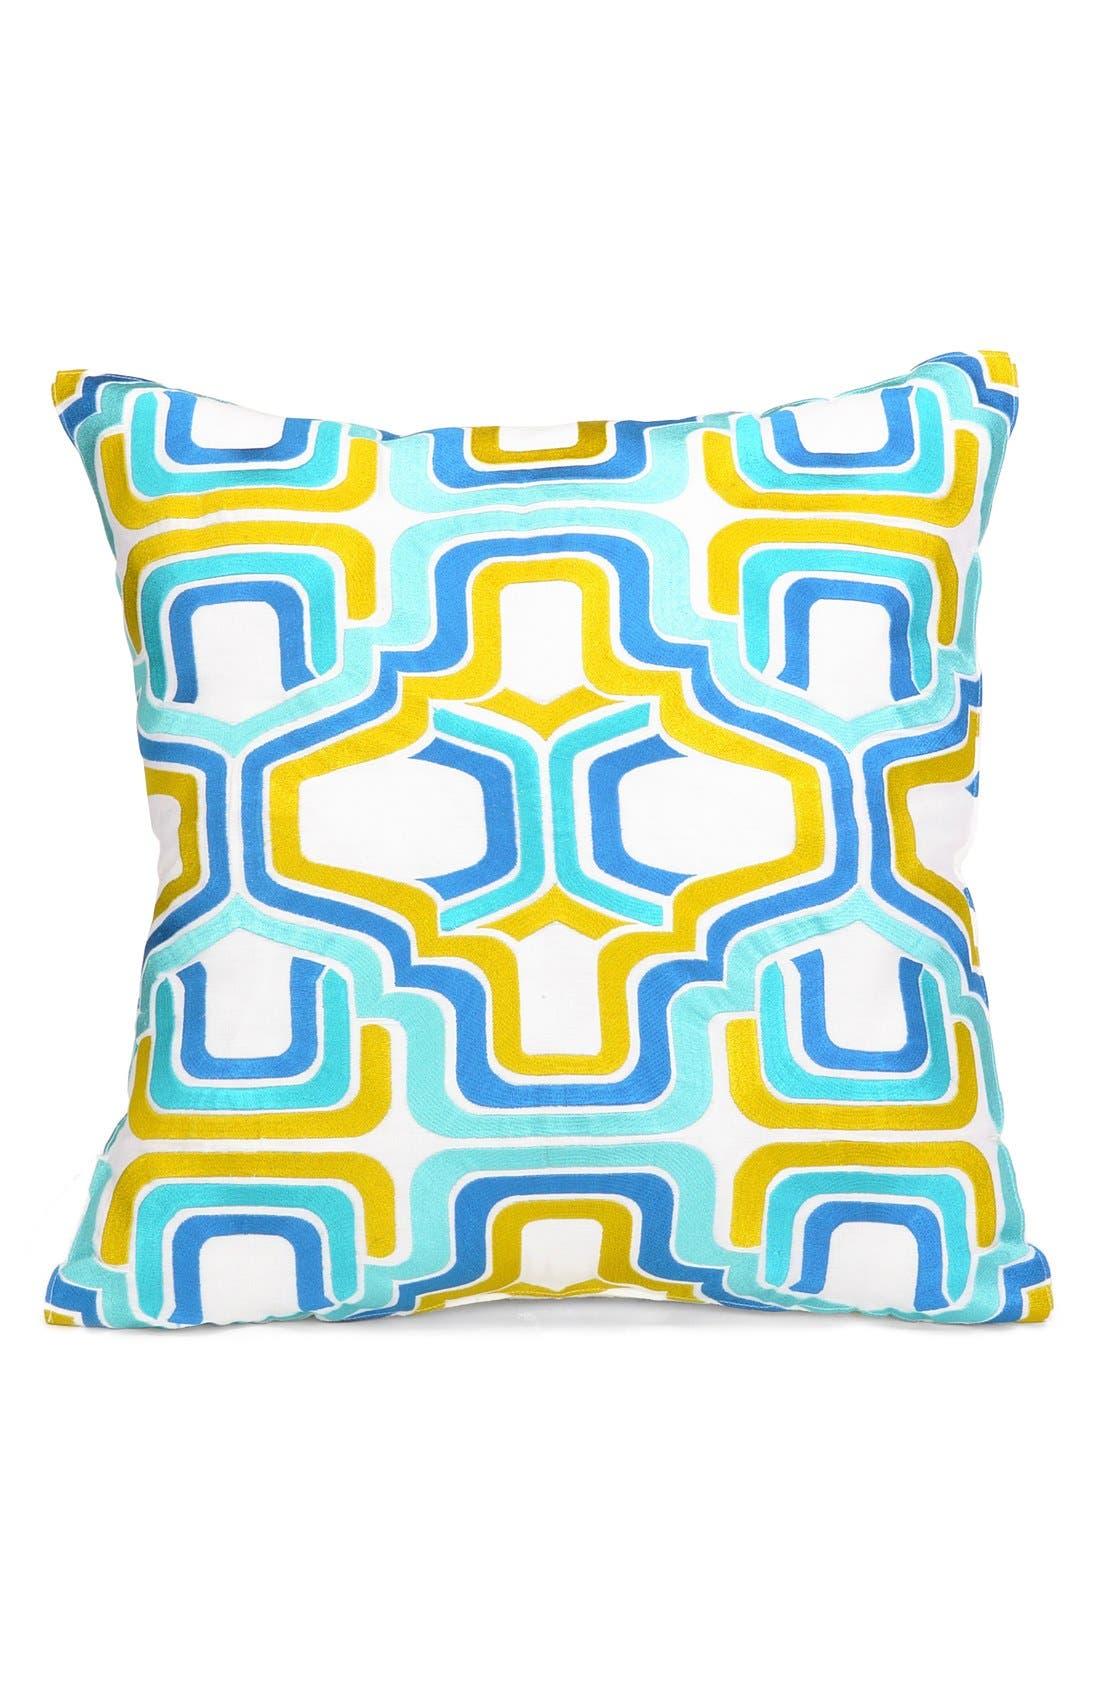 Alternate Image 1 Selected - Trina Turk 'Santorini' Square Accent Pillow